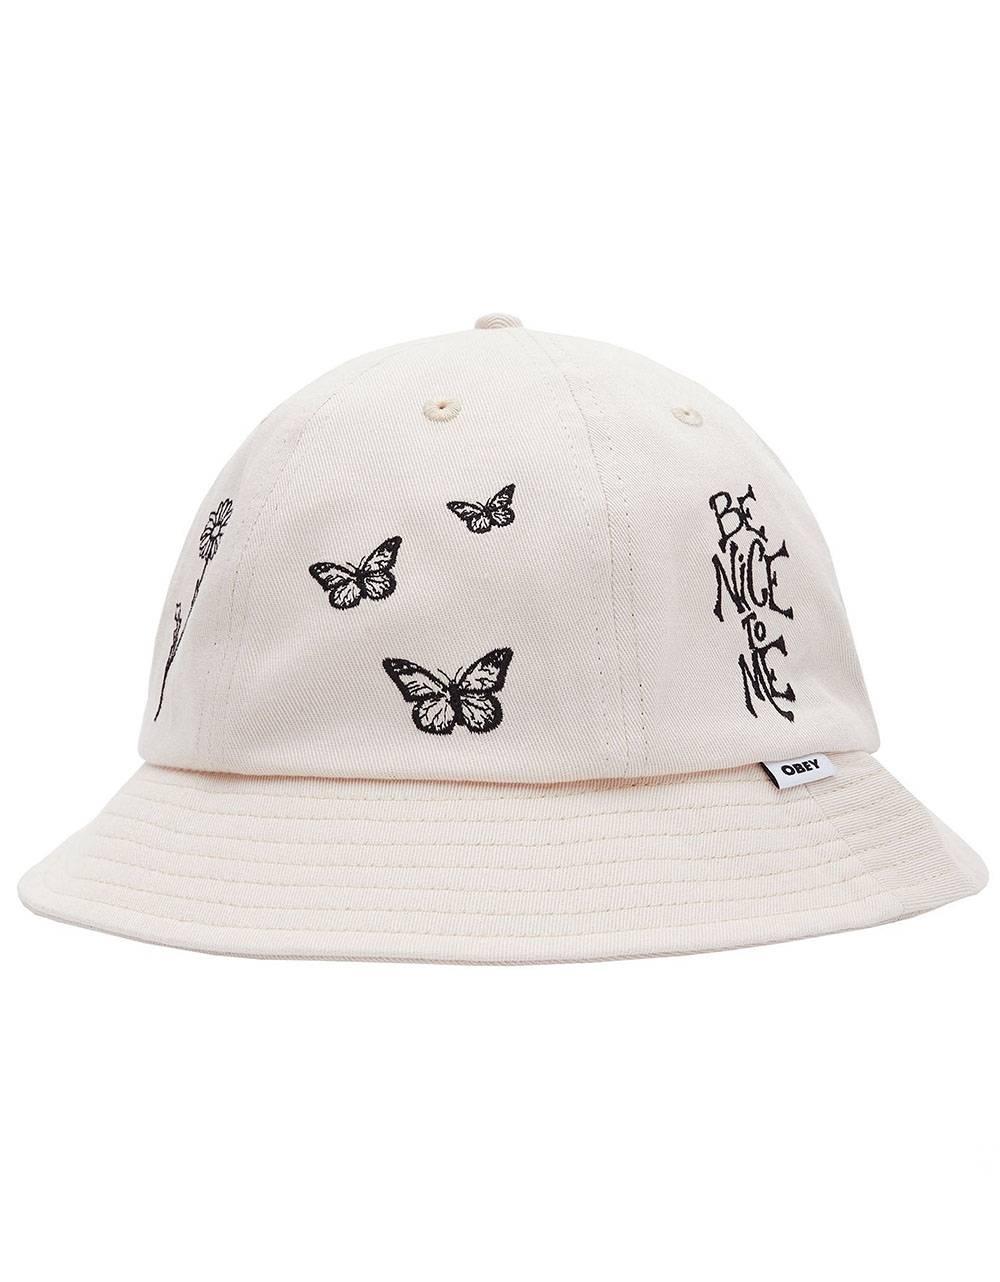 Obey printed 6 panel bucket hat - sago obey Hat 49,00€